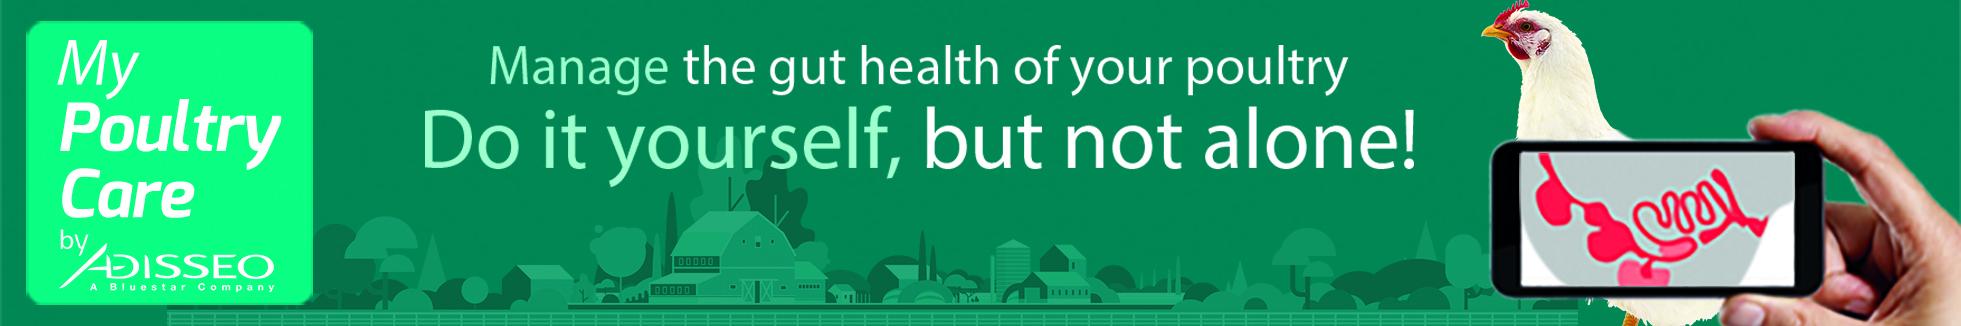 MyPoultryCare app for poultry gut health desease detection.